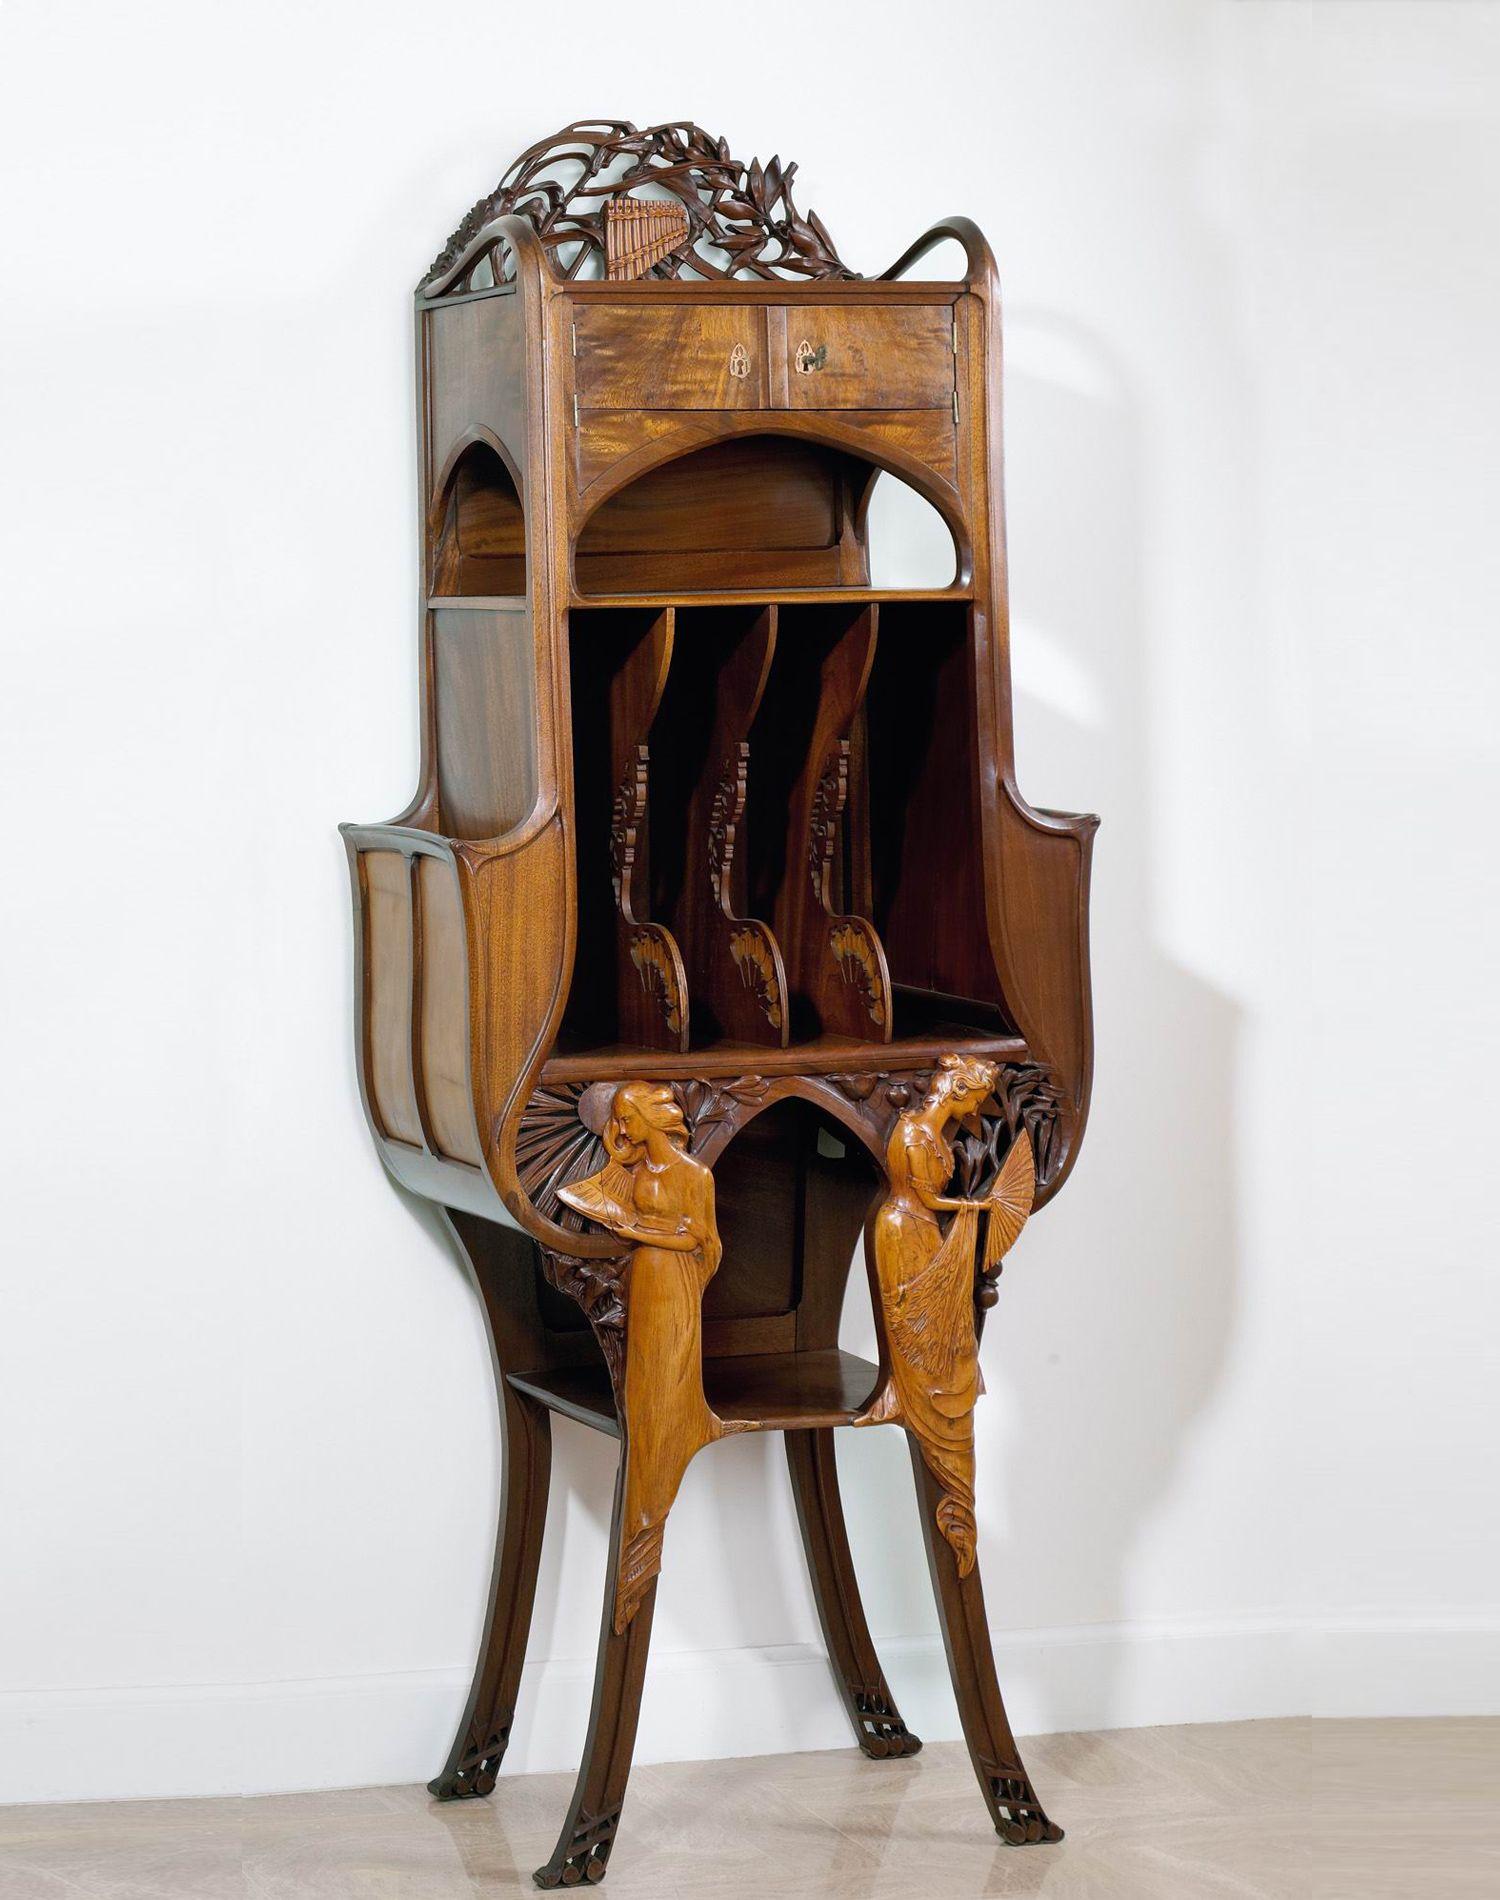 Rene Deflandre A Music Cabinet 1900 Deco